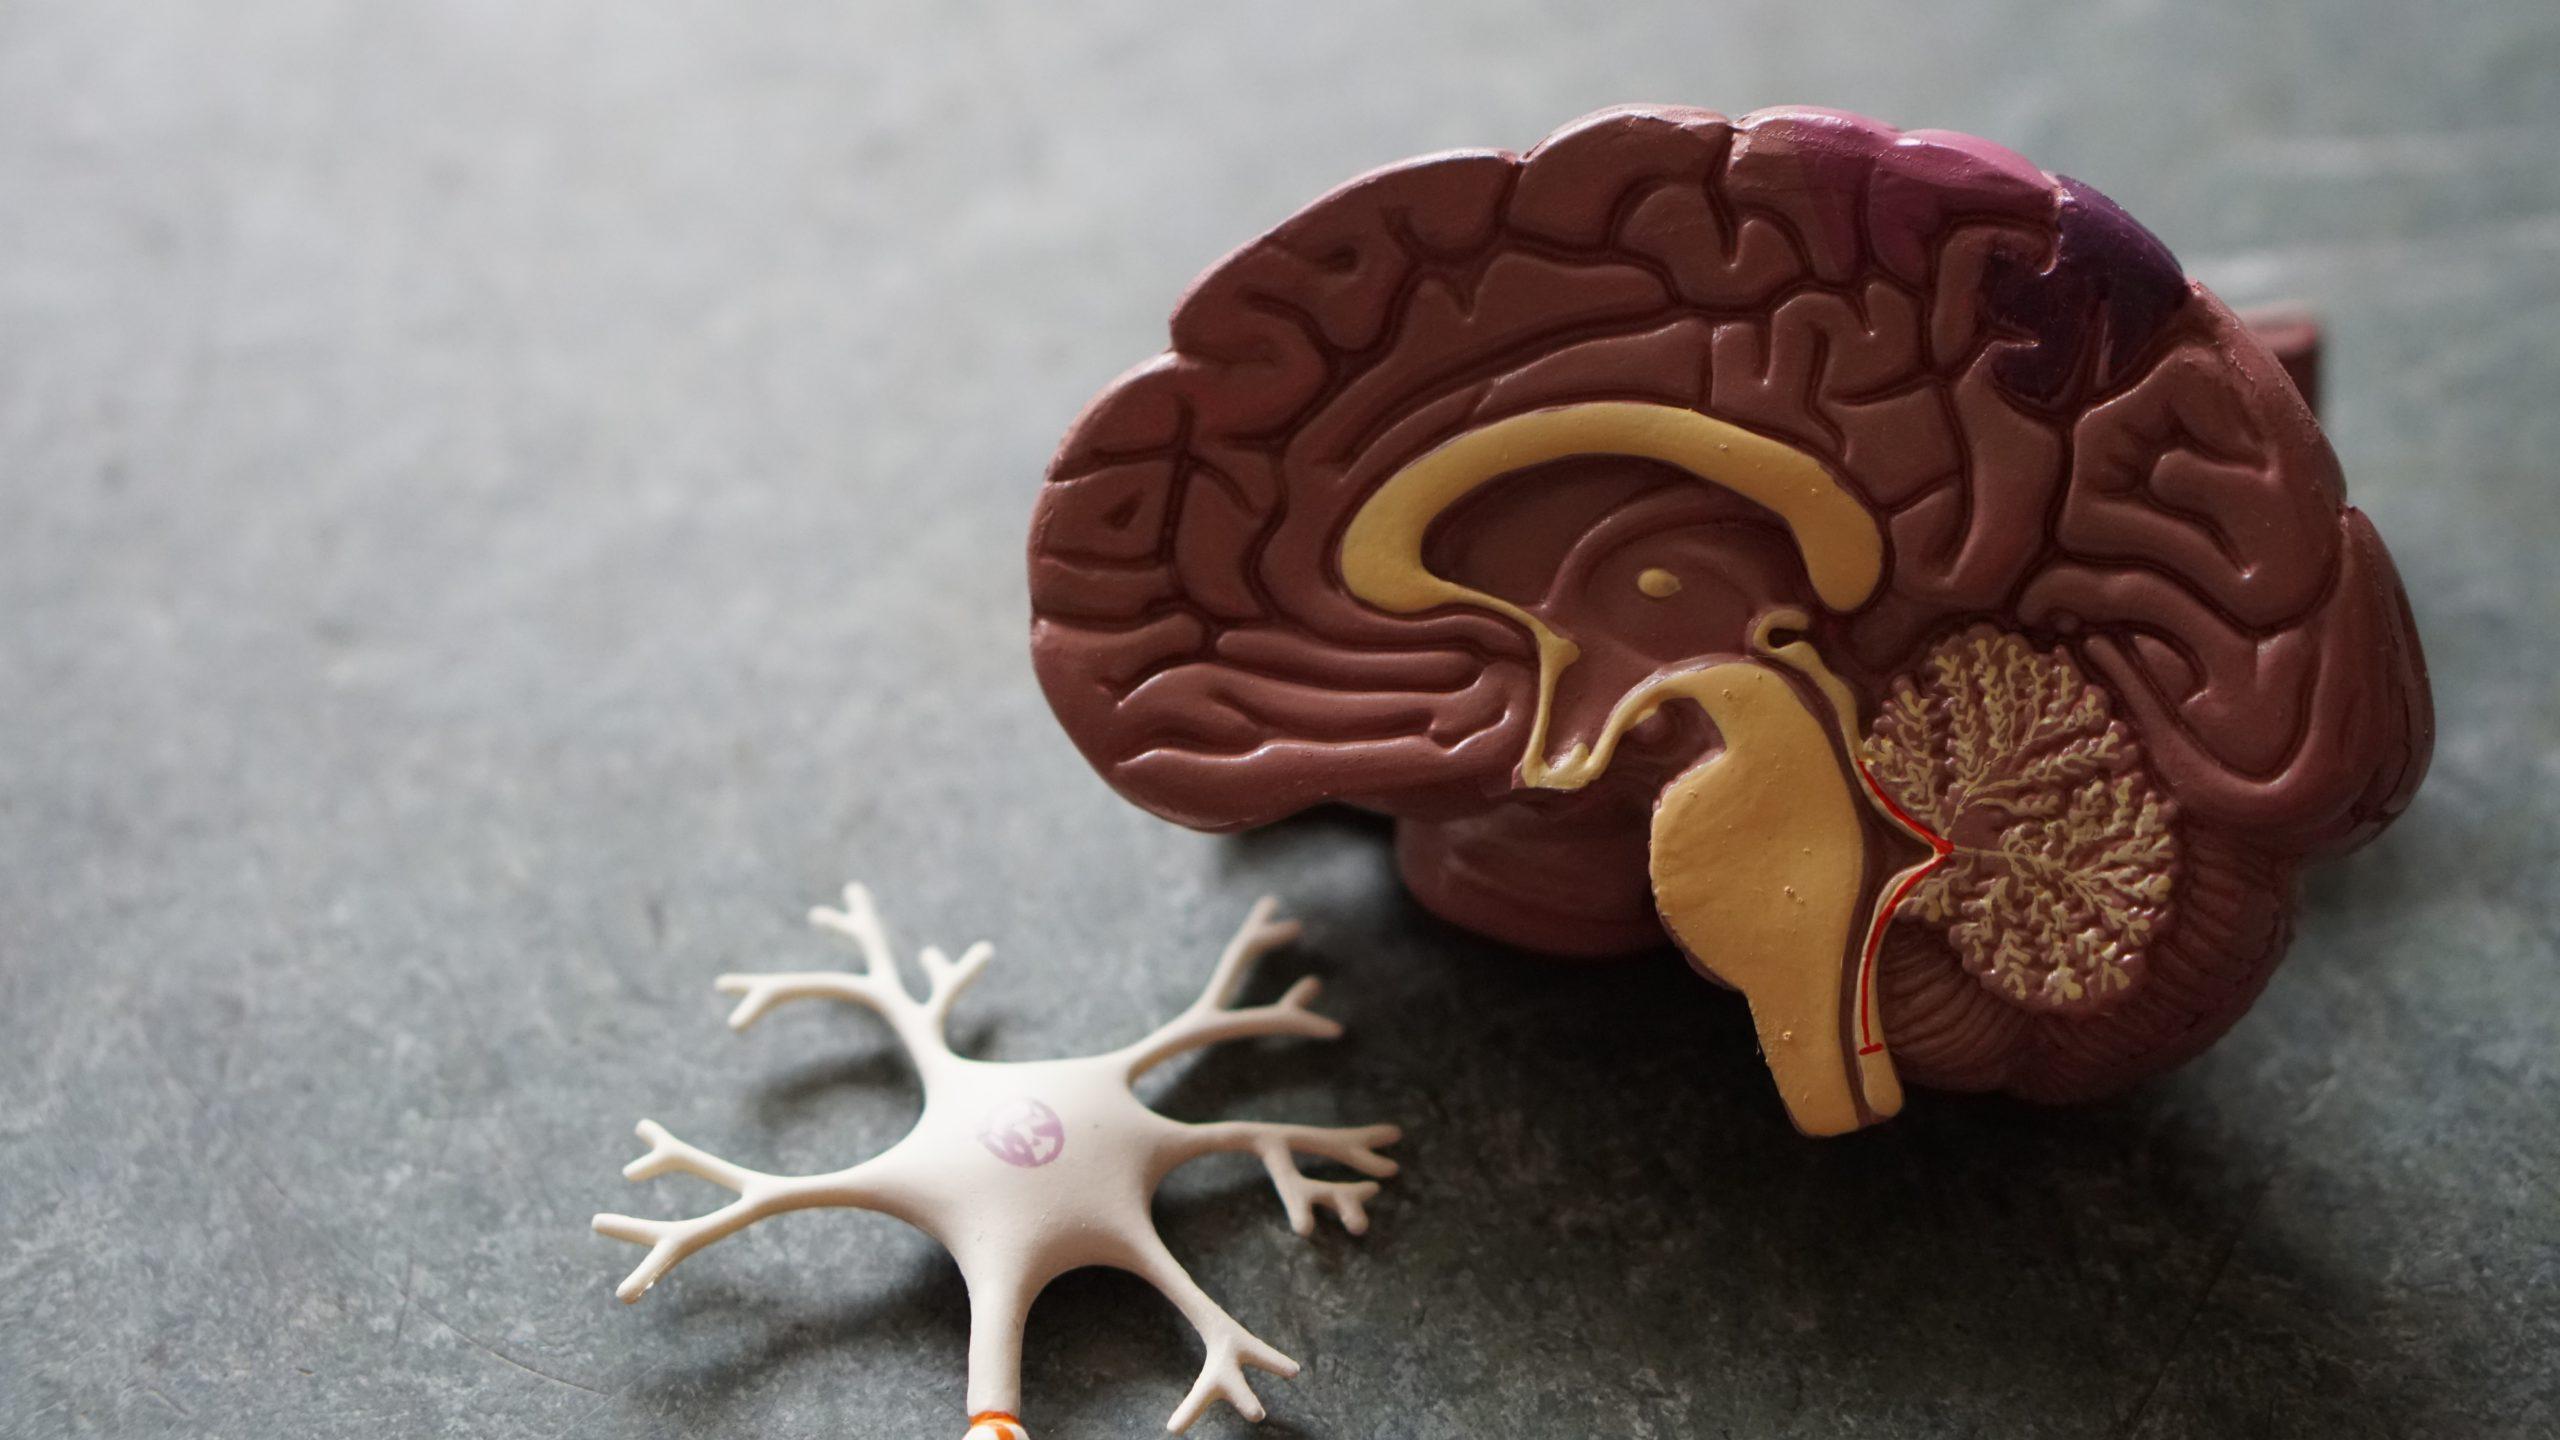 30+ alarming Alzheimer's symptoms